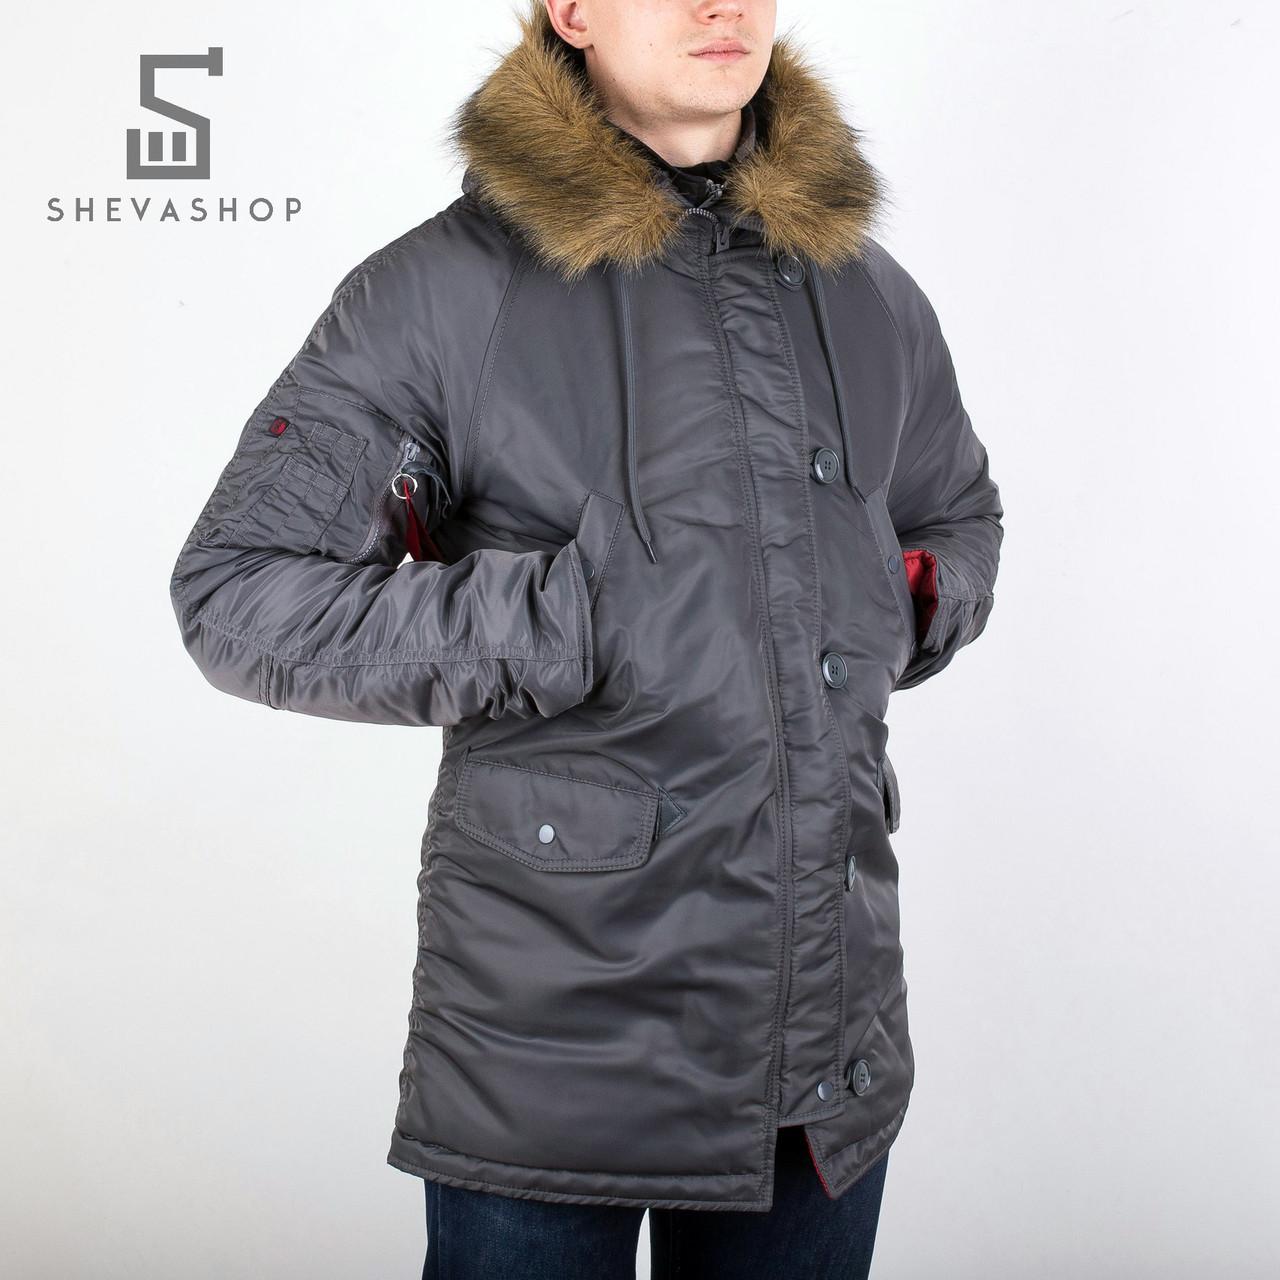 Зимняя мужская куртка Chameleon серая, фото 1